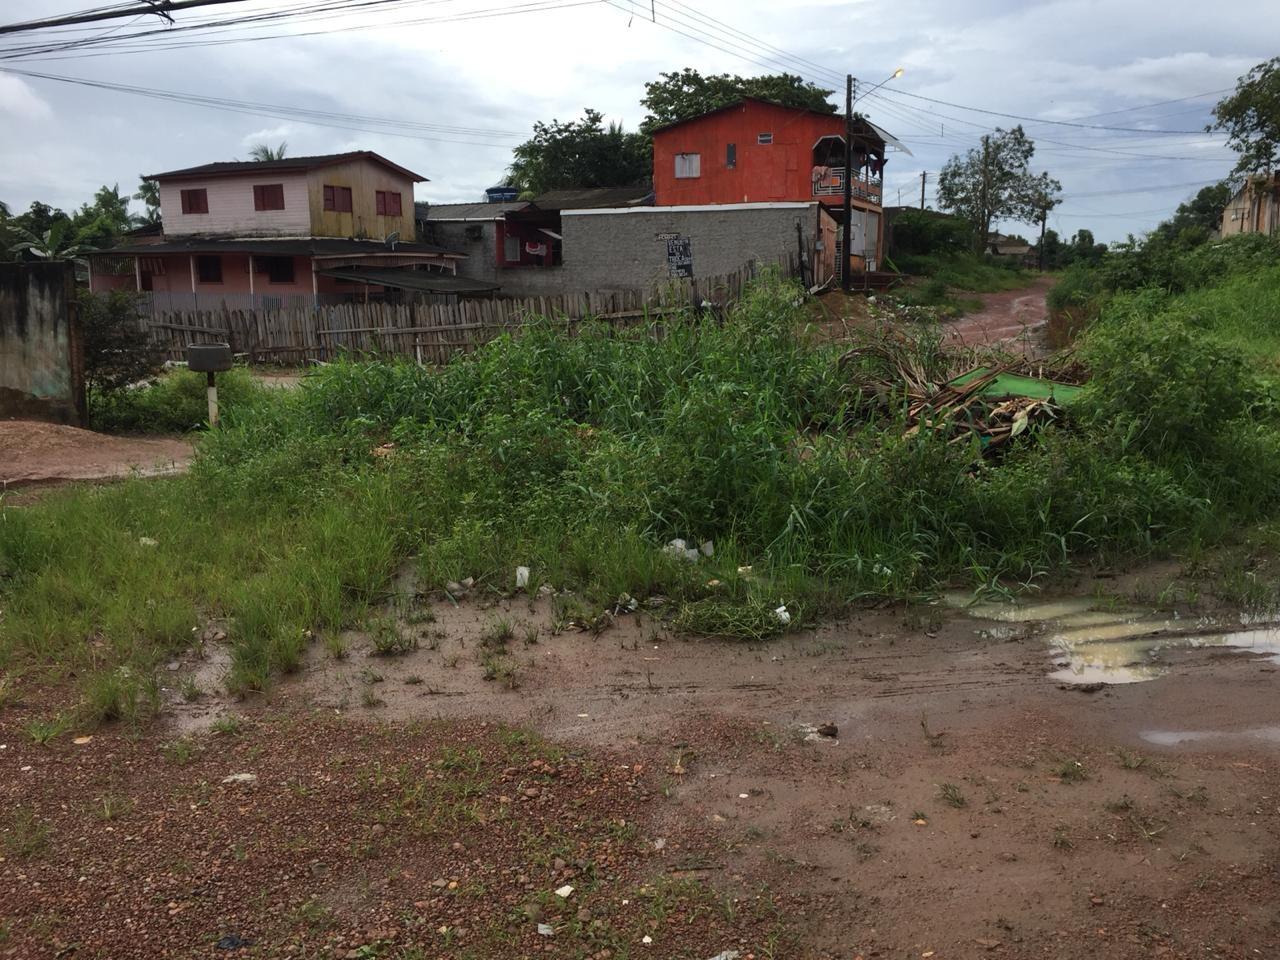 Lama, lixo e mato alto limitam tráfego de moradores e veículos na Zona Norte de Macapá